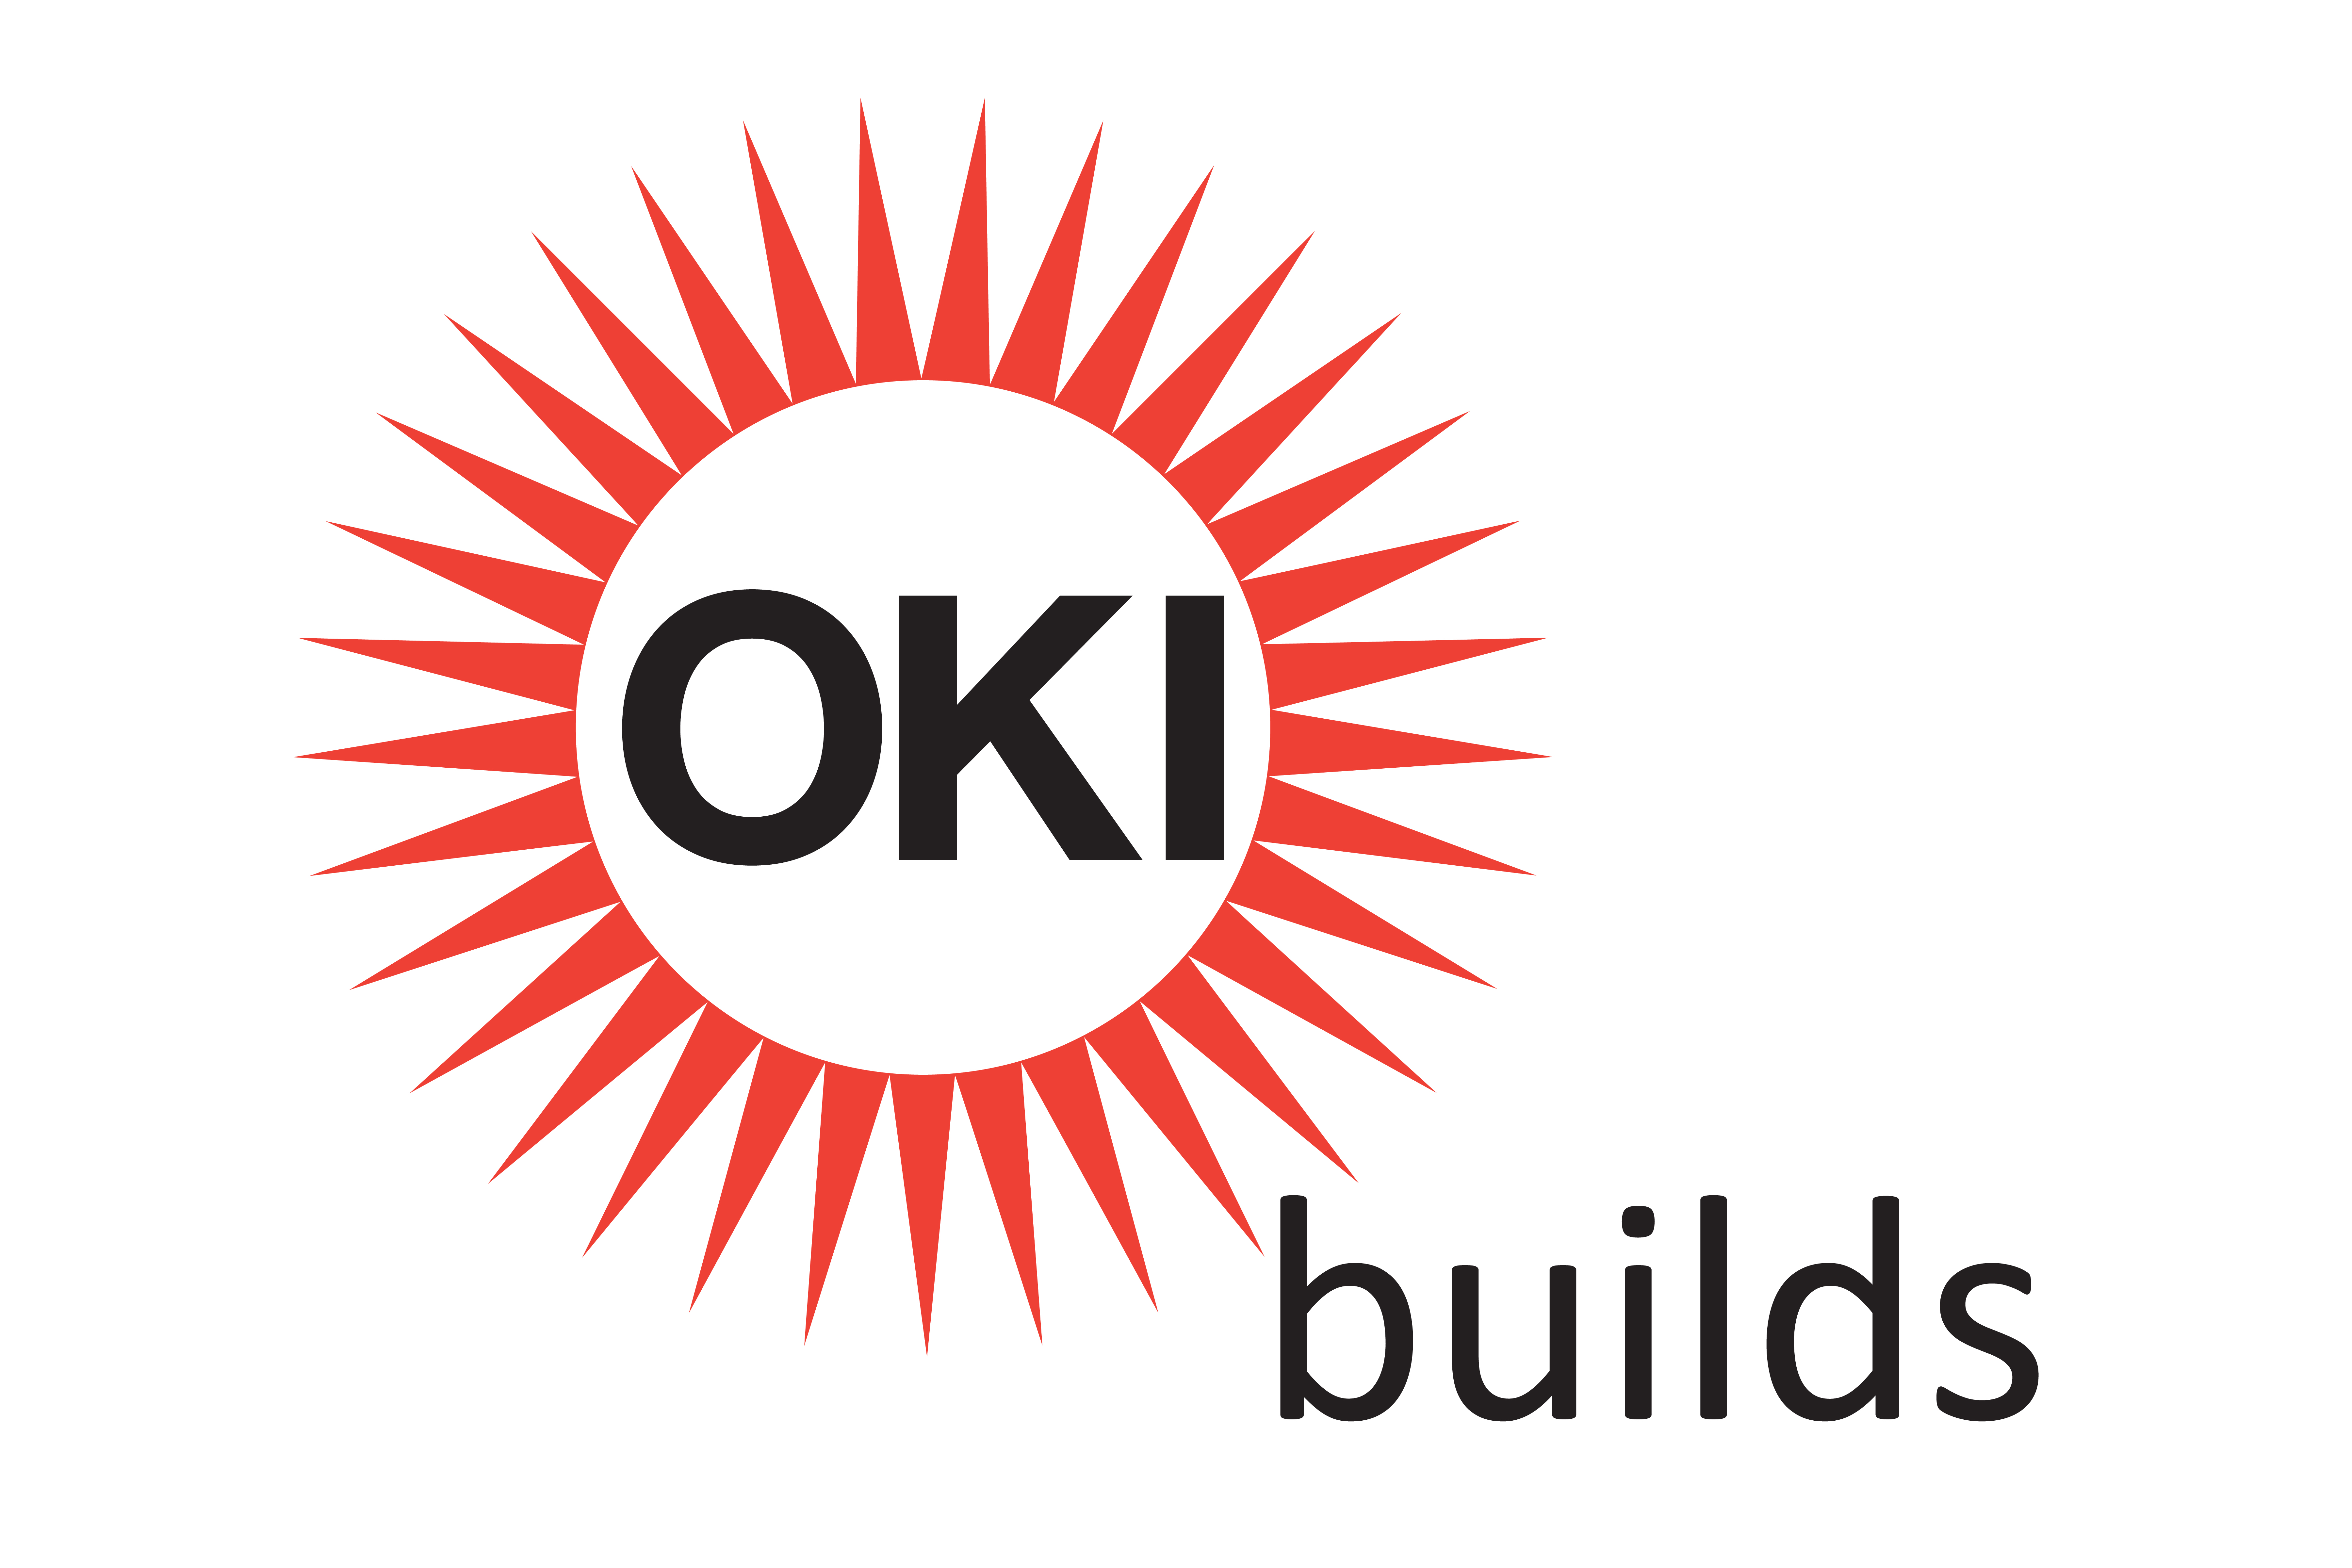 OKI Builds logo